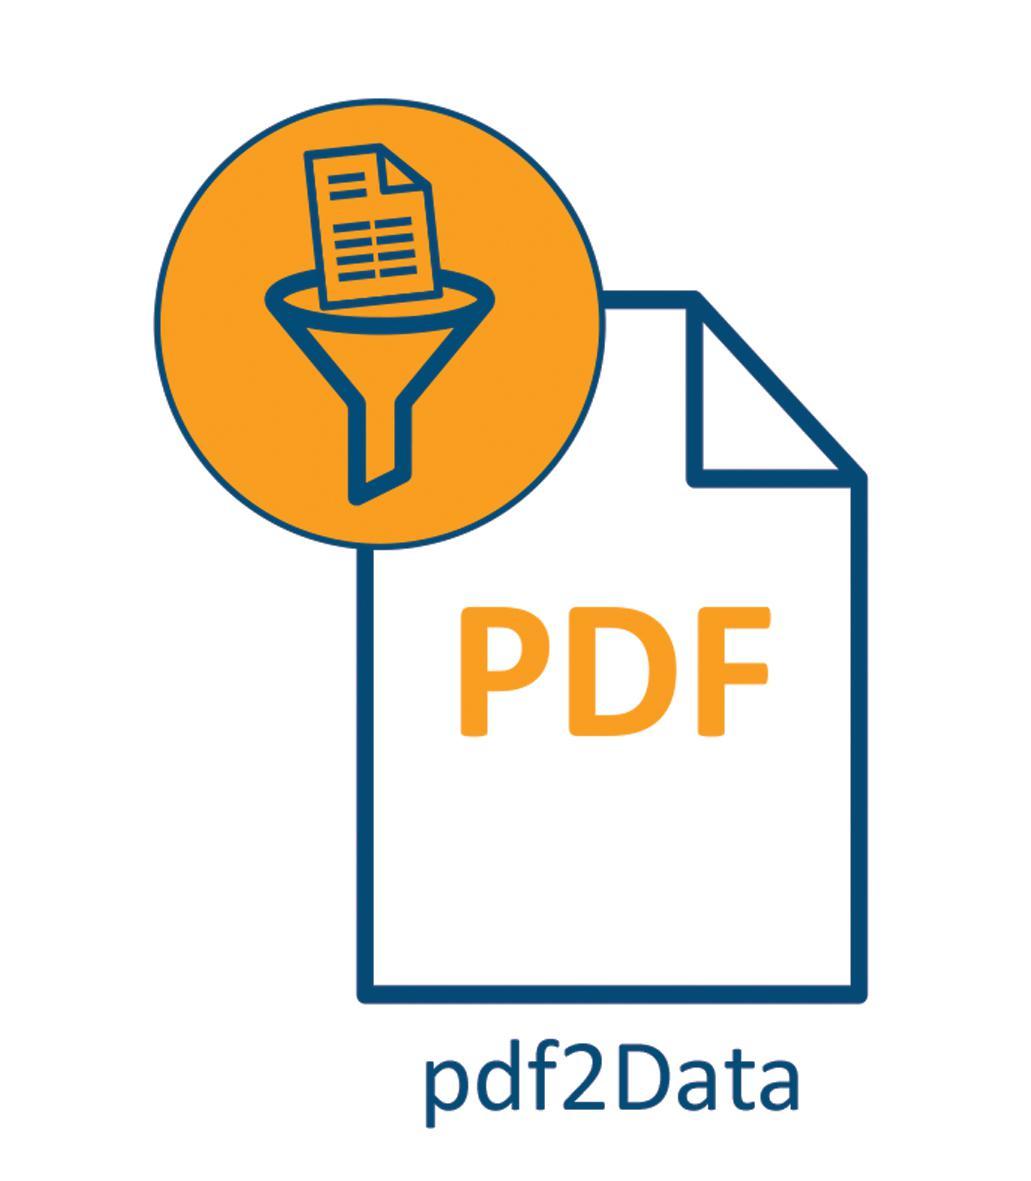 pdf2Data